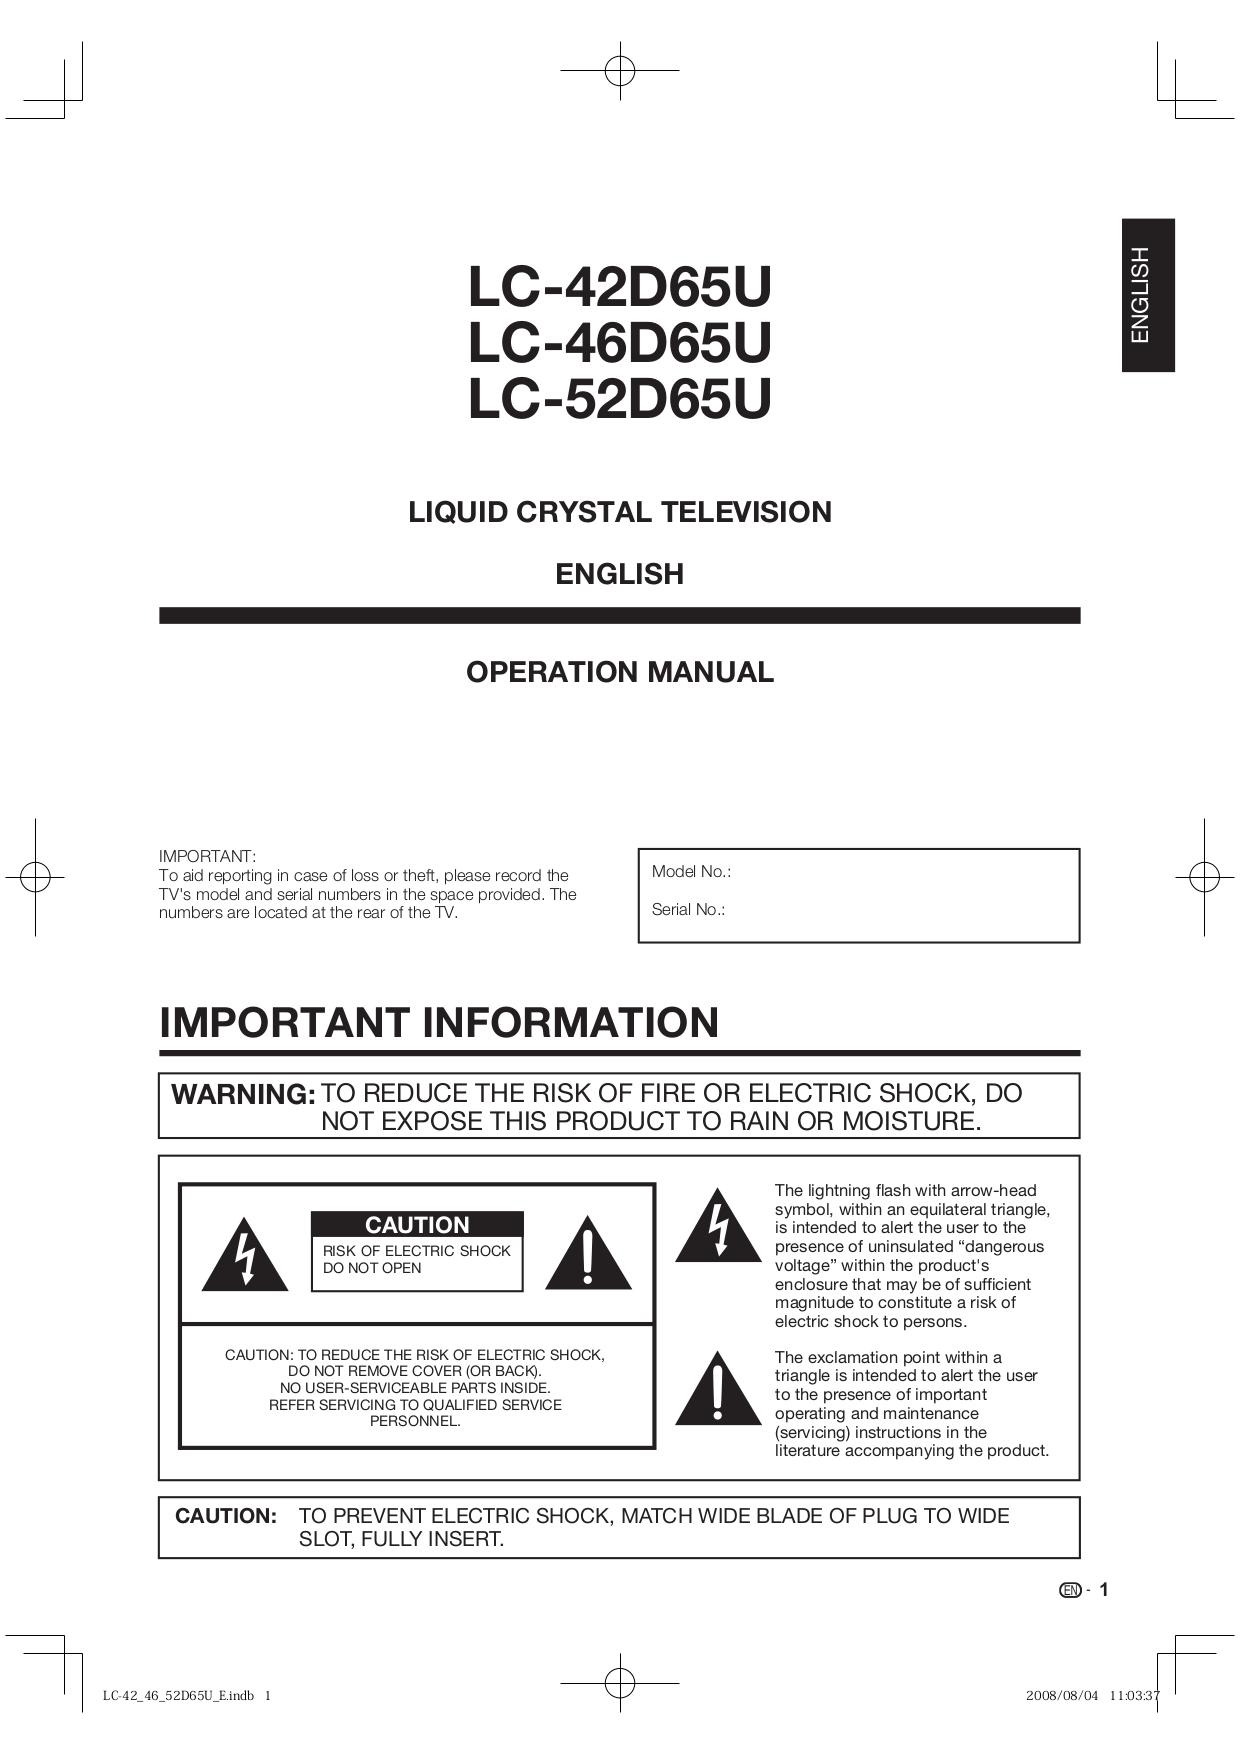 download free pdf for sharp aquos lc 42d65u tv manual rh umlib com sharp lc-42d65u service manual Microwave Oven Sharp R 308J